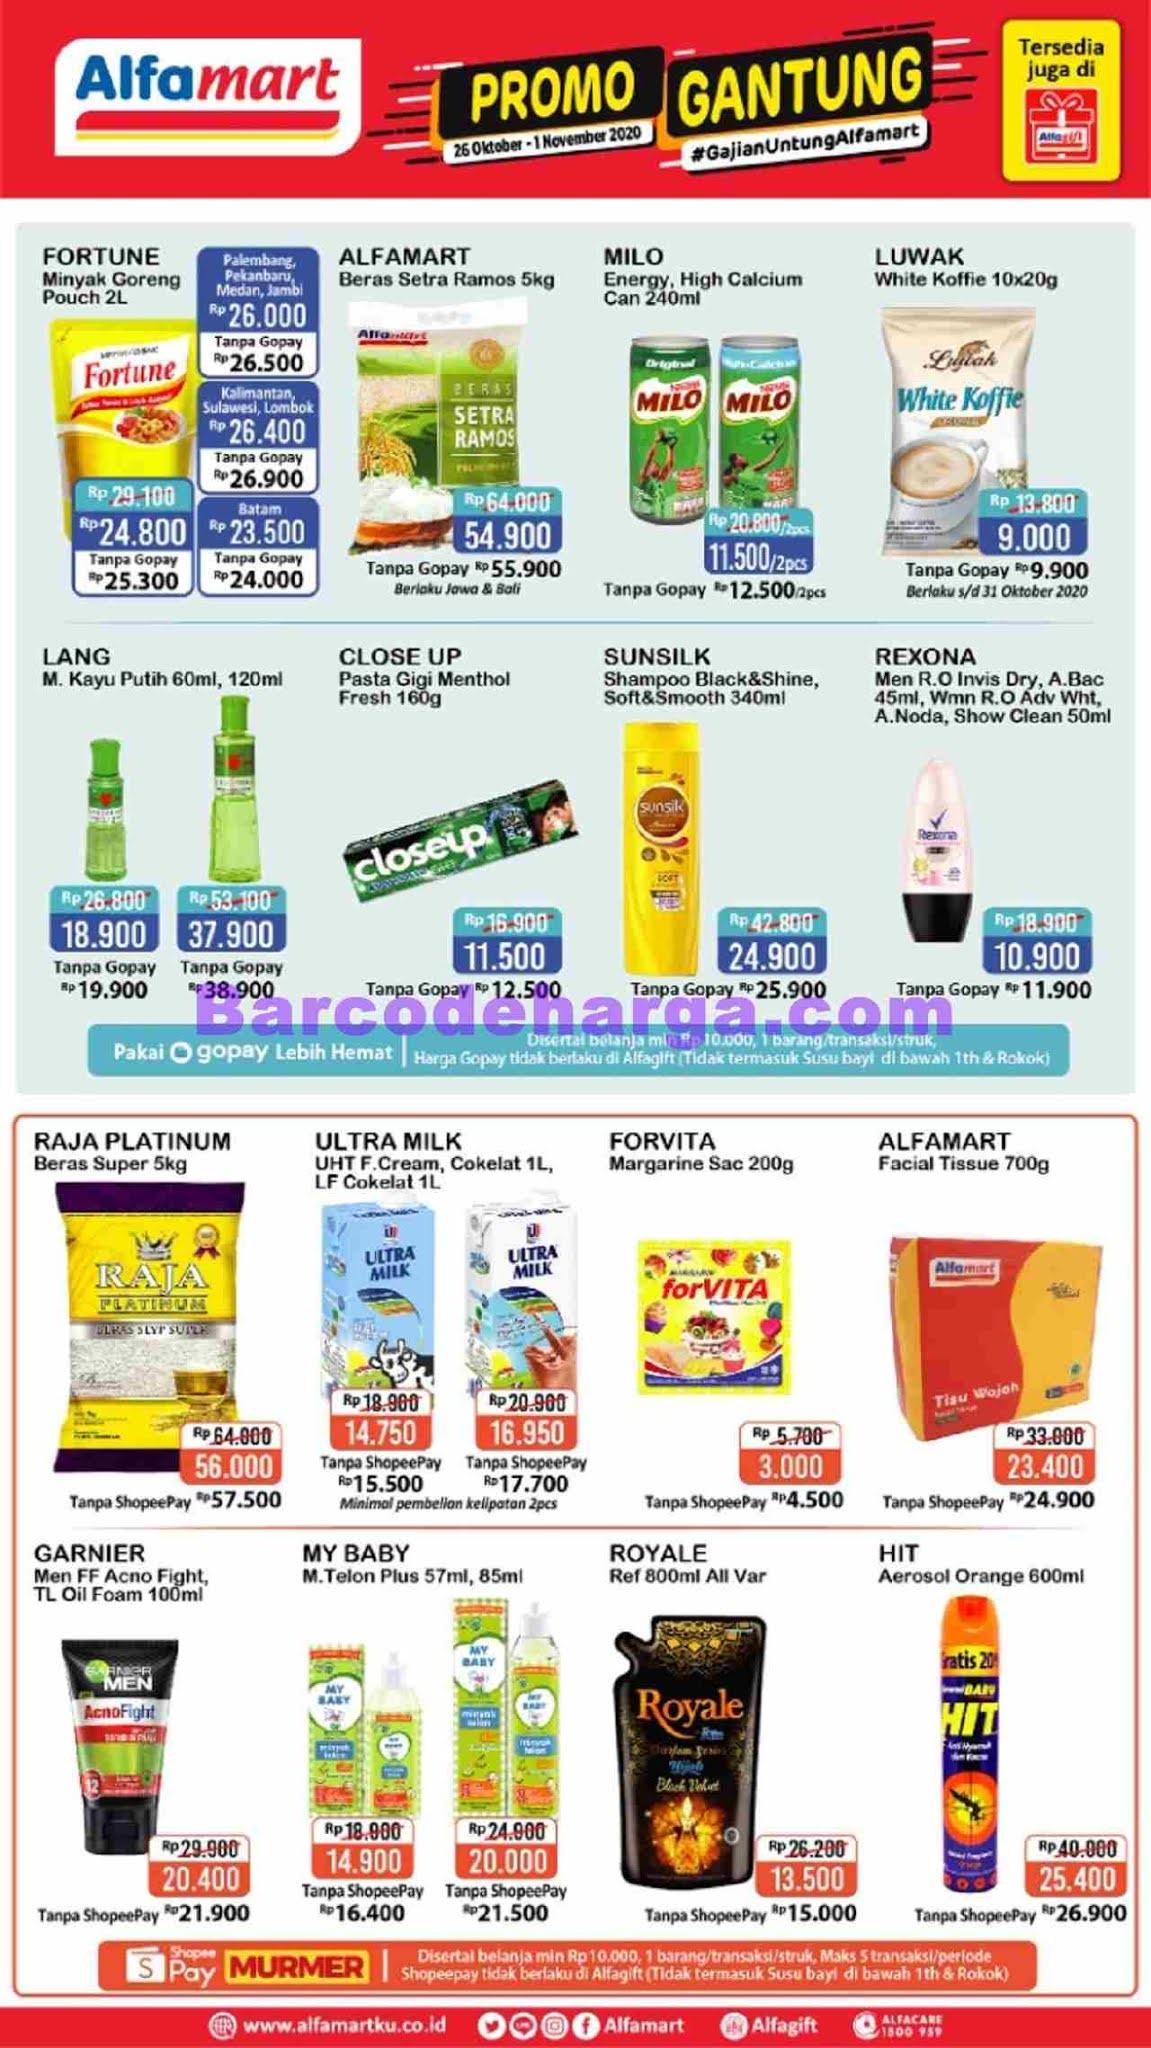 Katalog Promo Gantung Alfamart 26 Oktober 1 November 2020 Barcodeharga Harga Promo Alfamart Indomaret Giant Hypermart Superindo Lottemart Carrefour